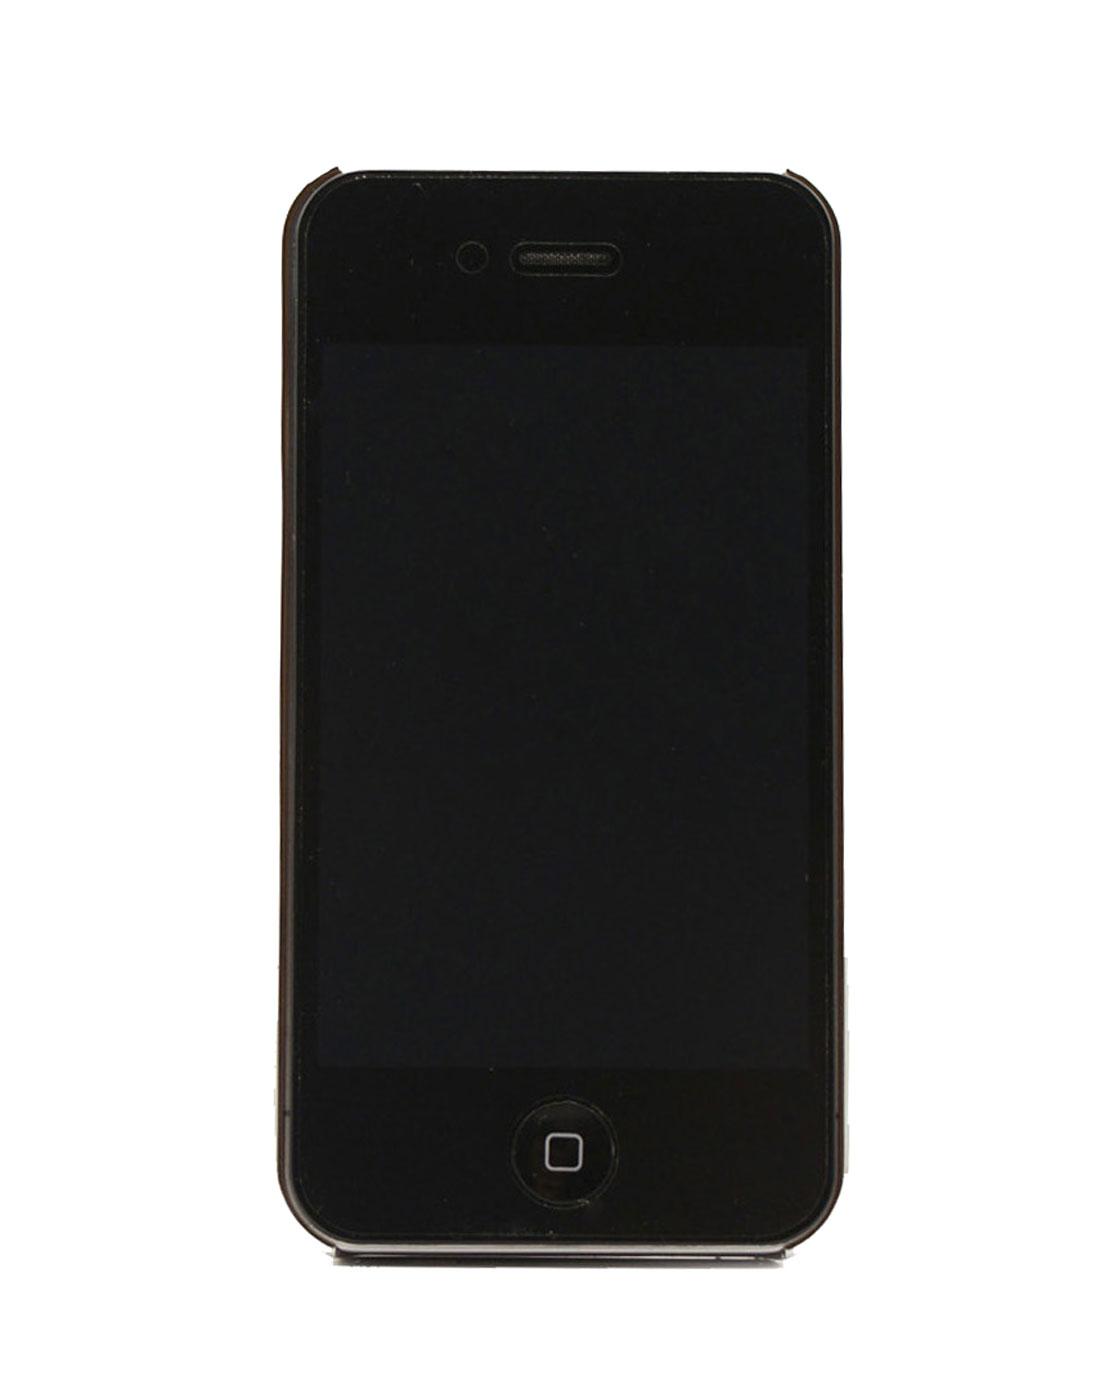 iphone4/4s 保护壳 钻石星空系列 黑色